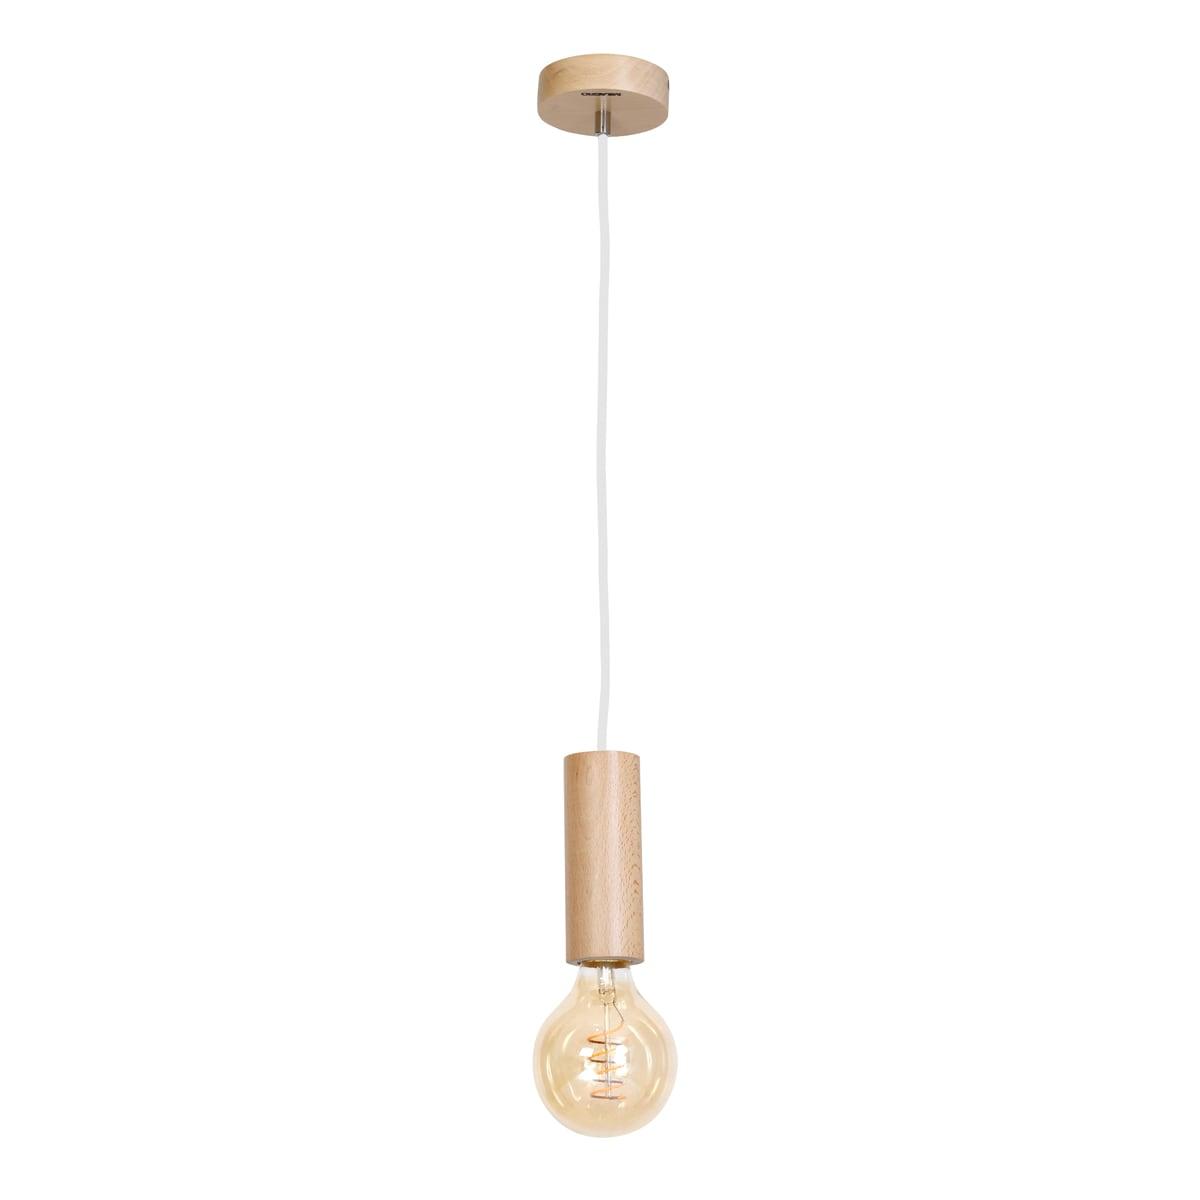 Lampa suspendată Milagro BOSCO 611 Lemn natural 1xE27 40W